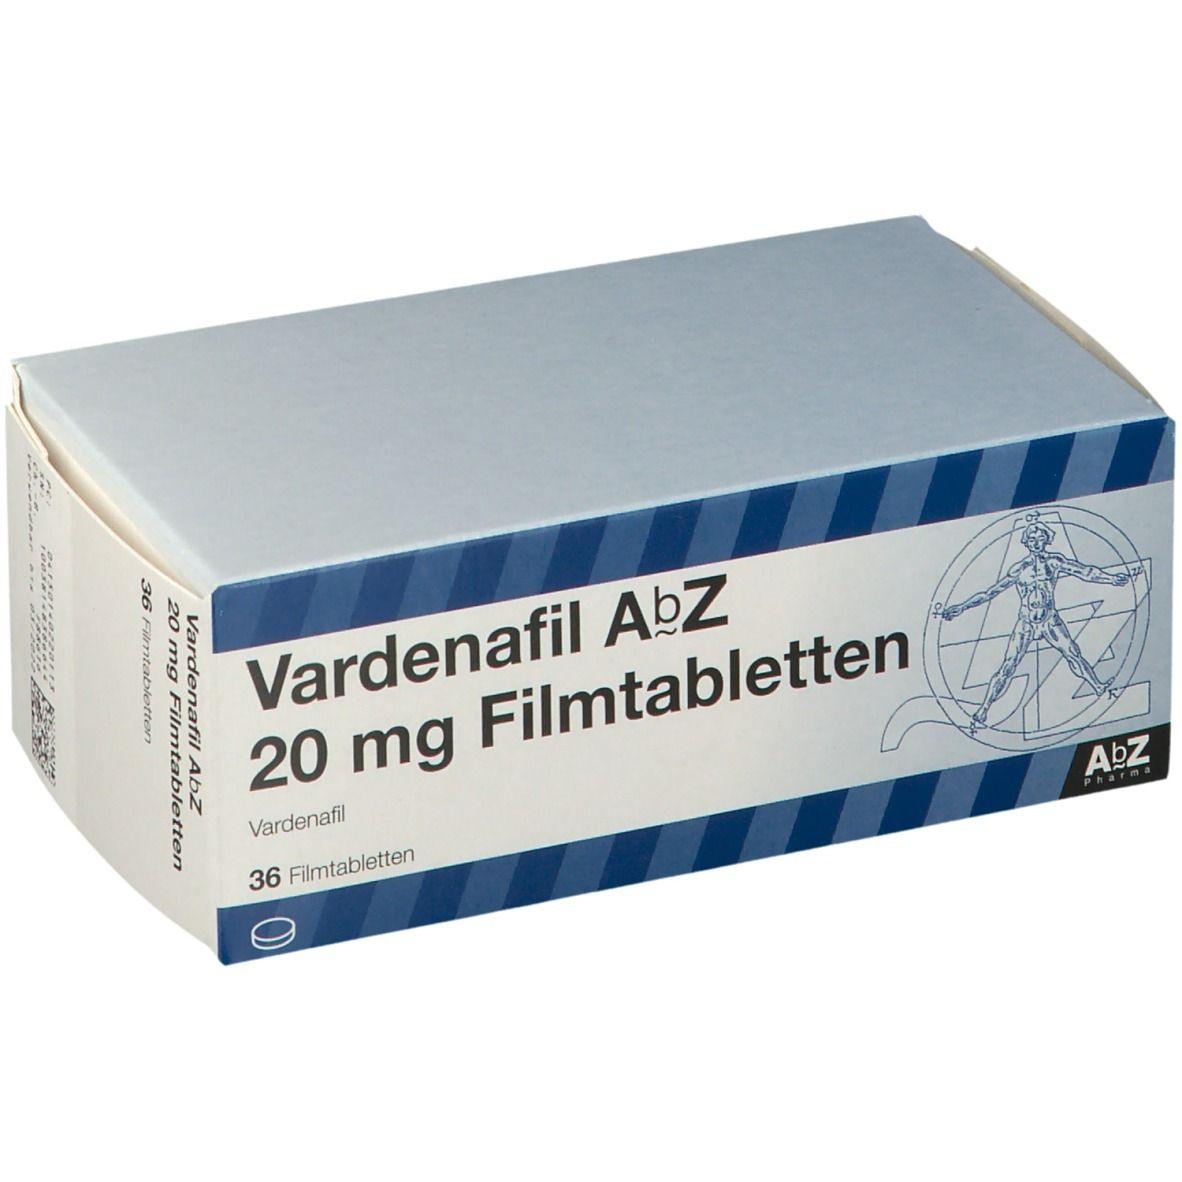 VARDENAFIL AbZ 20 mg Filmtabletten